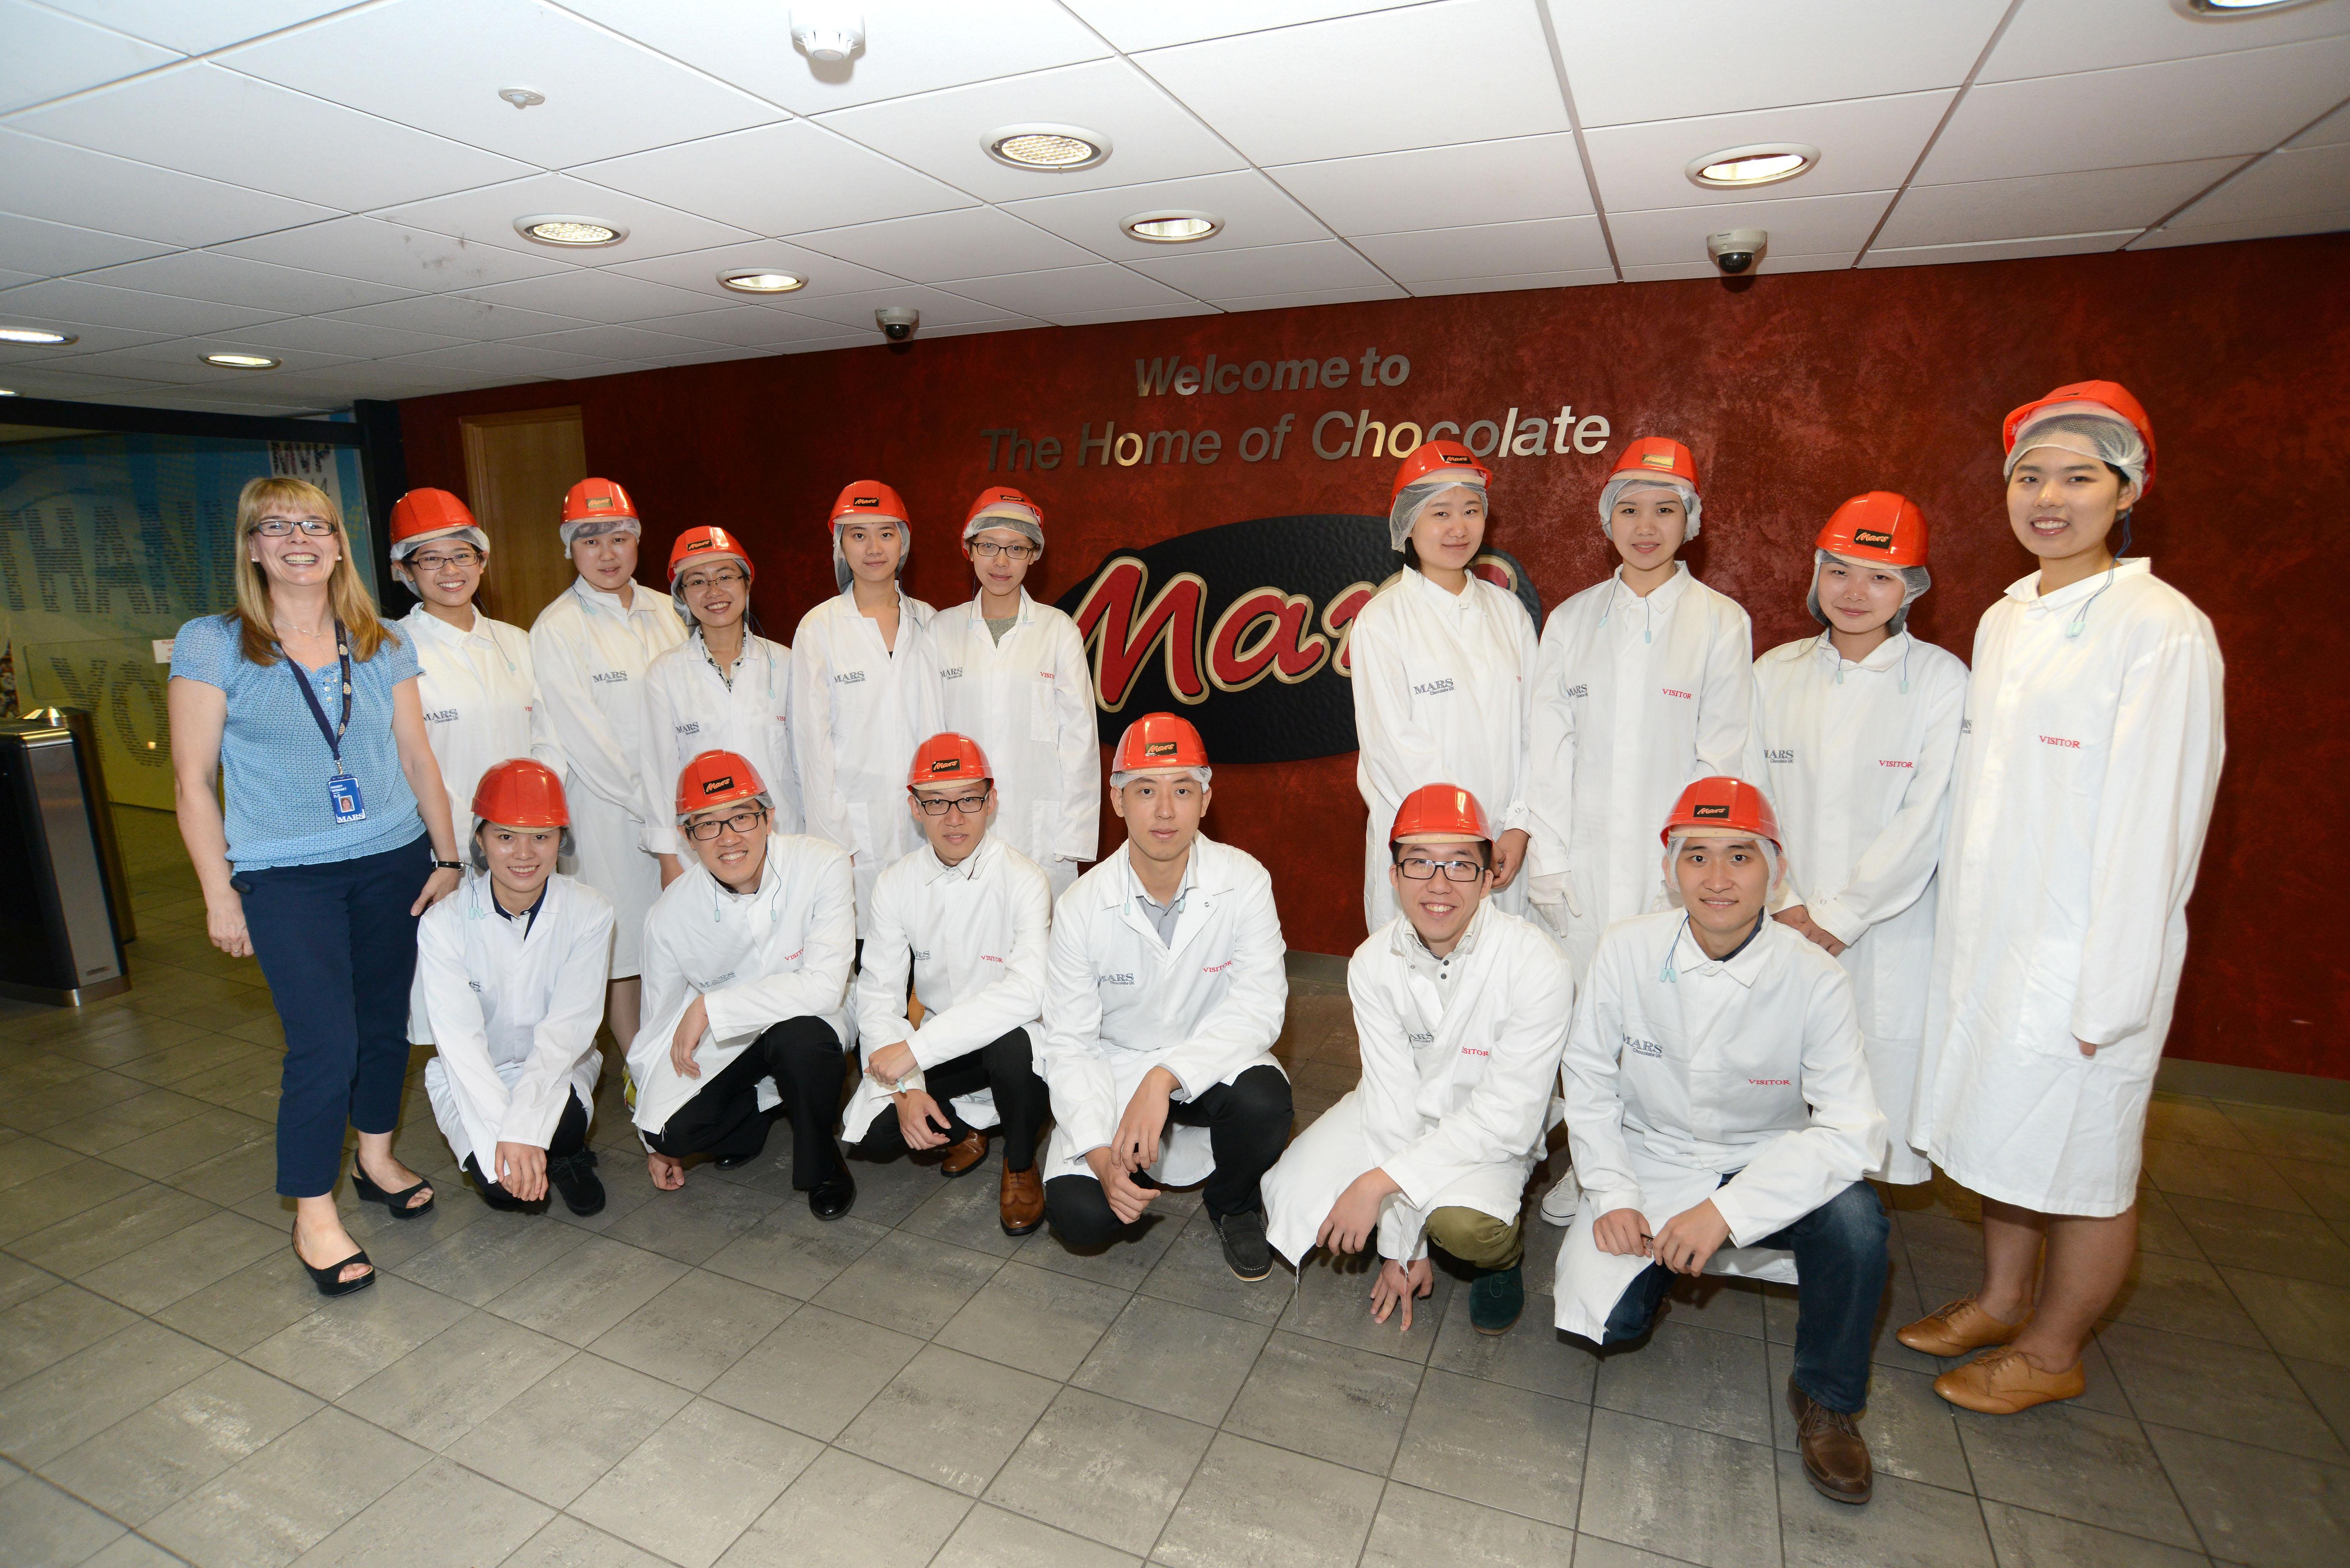 Mars Chocolate Factory Tour Slough